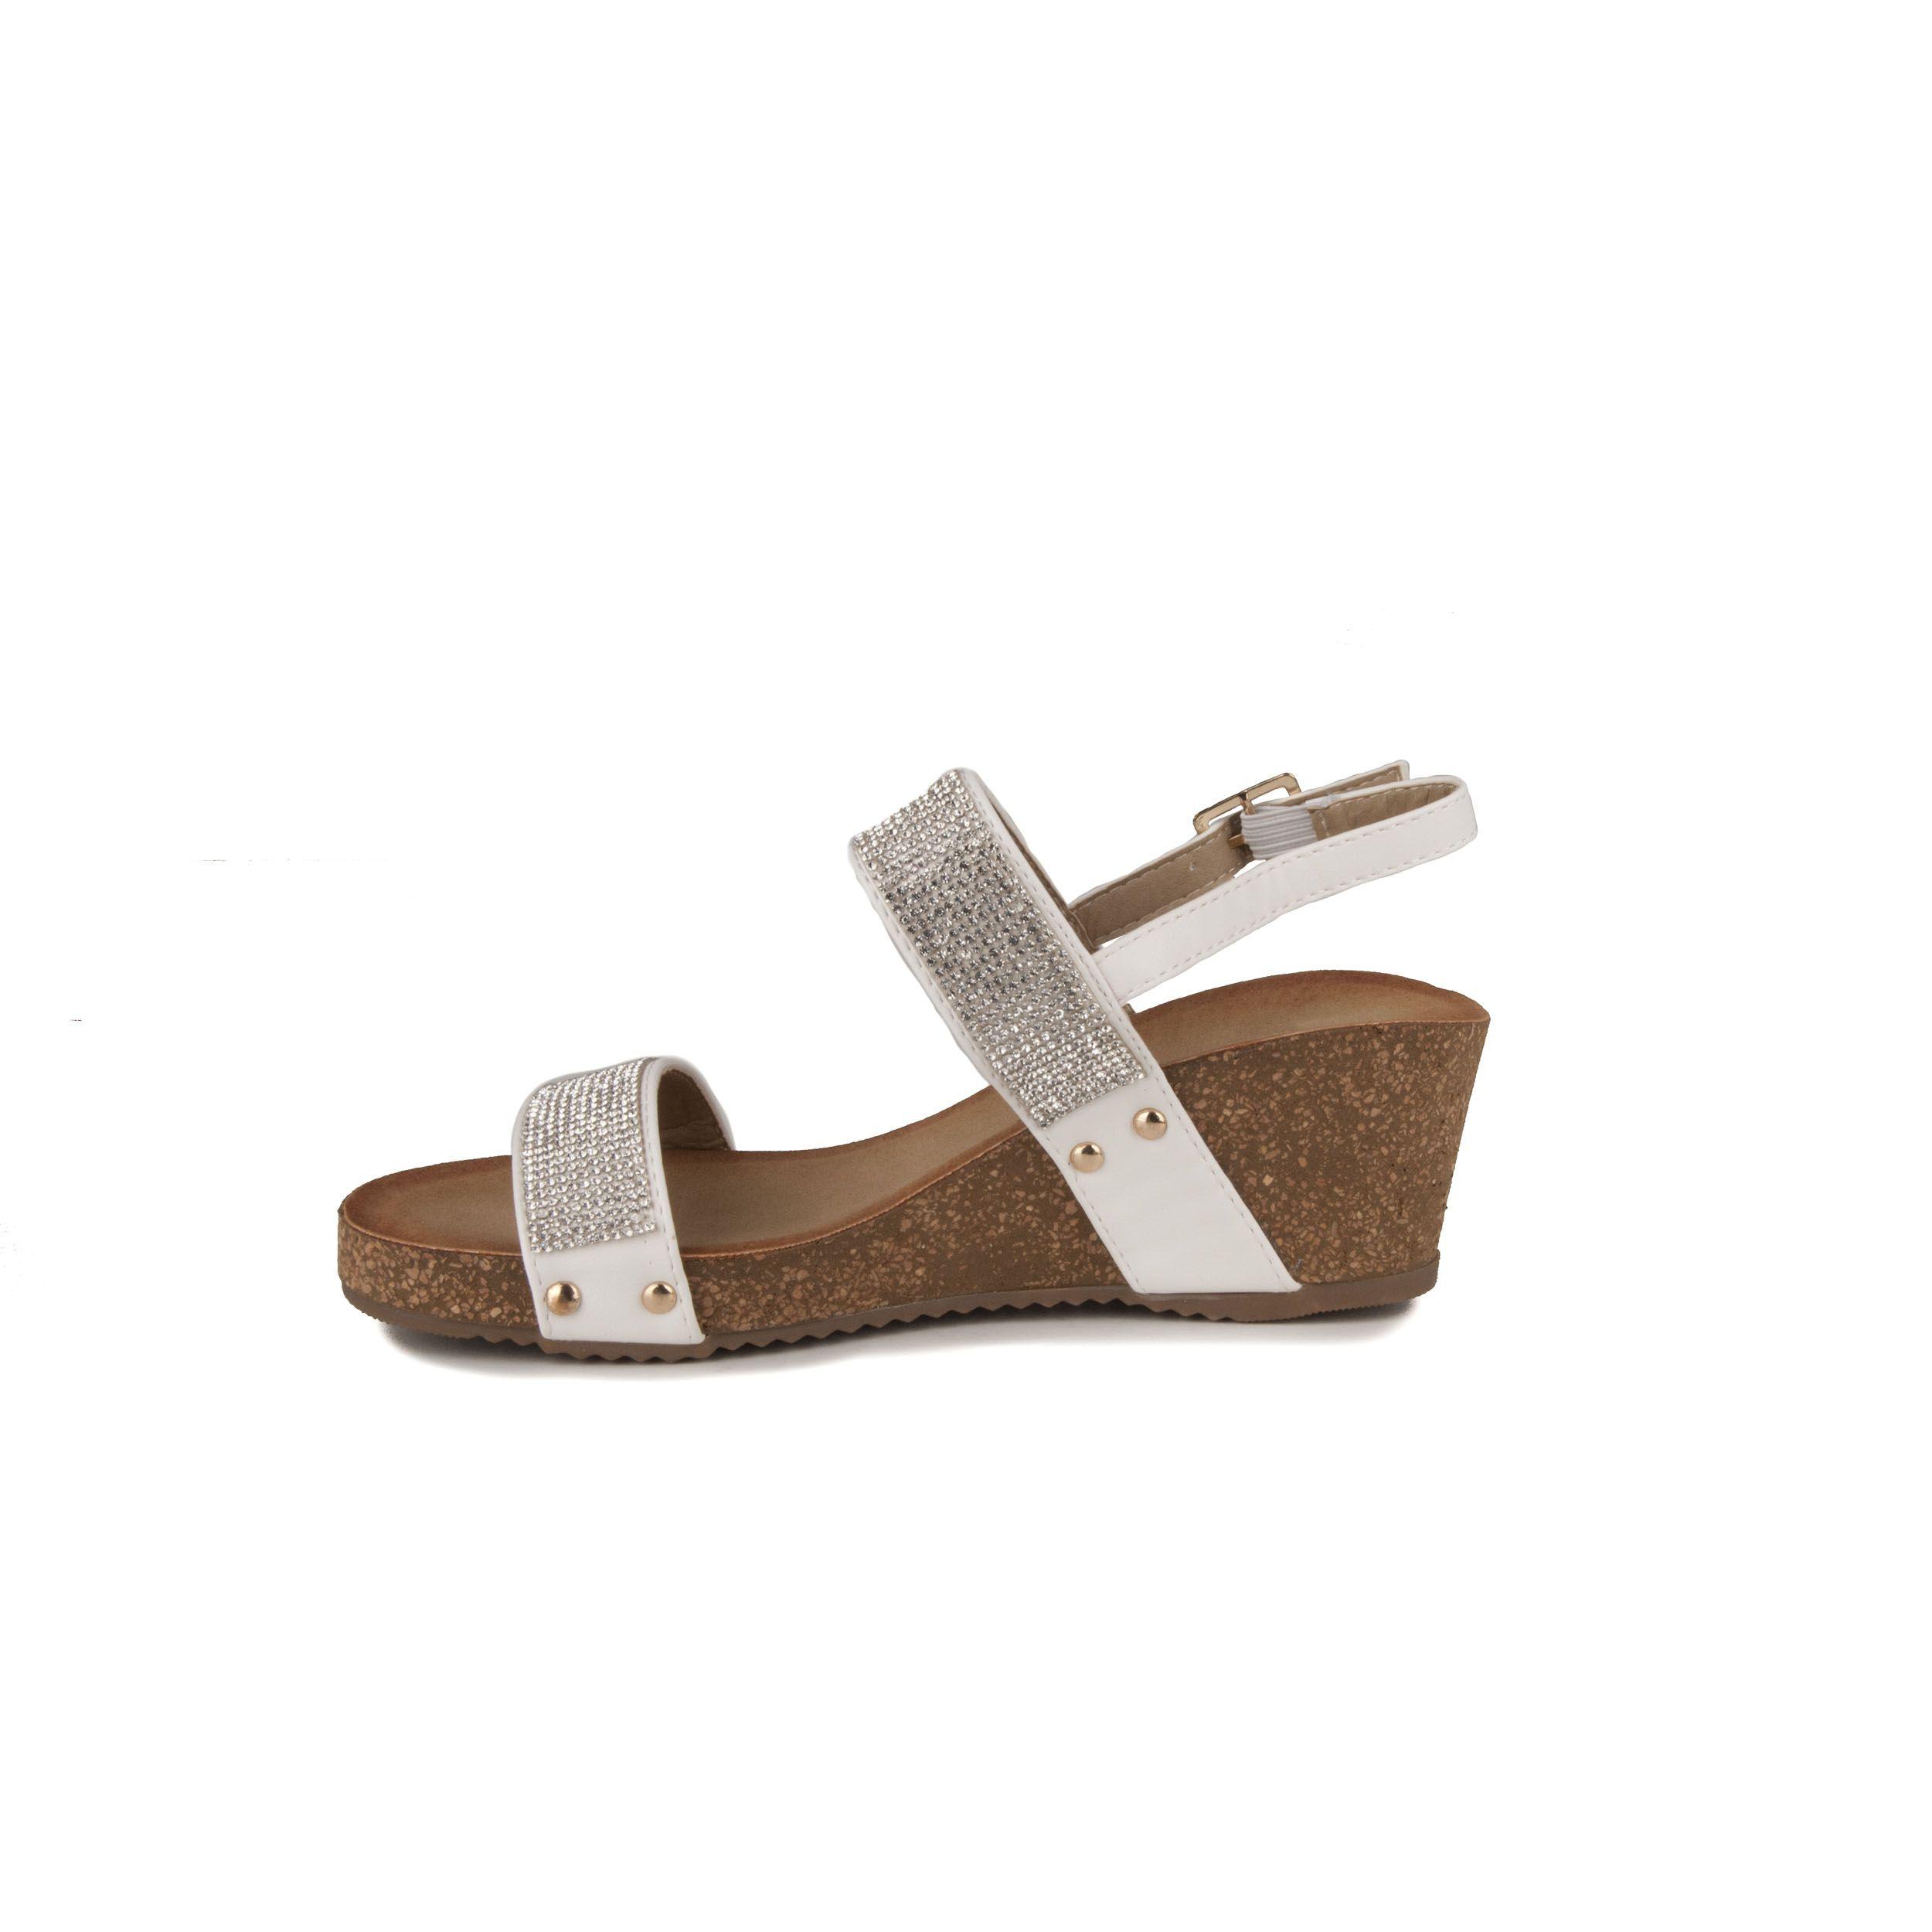 Purapiel Wedge Sandal in White